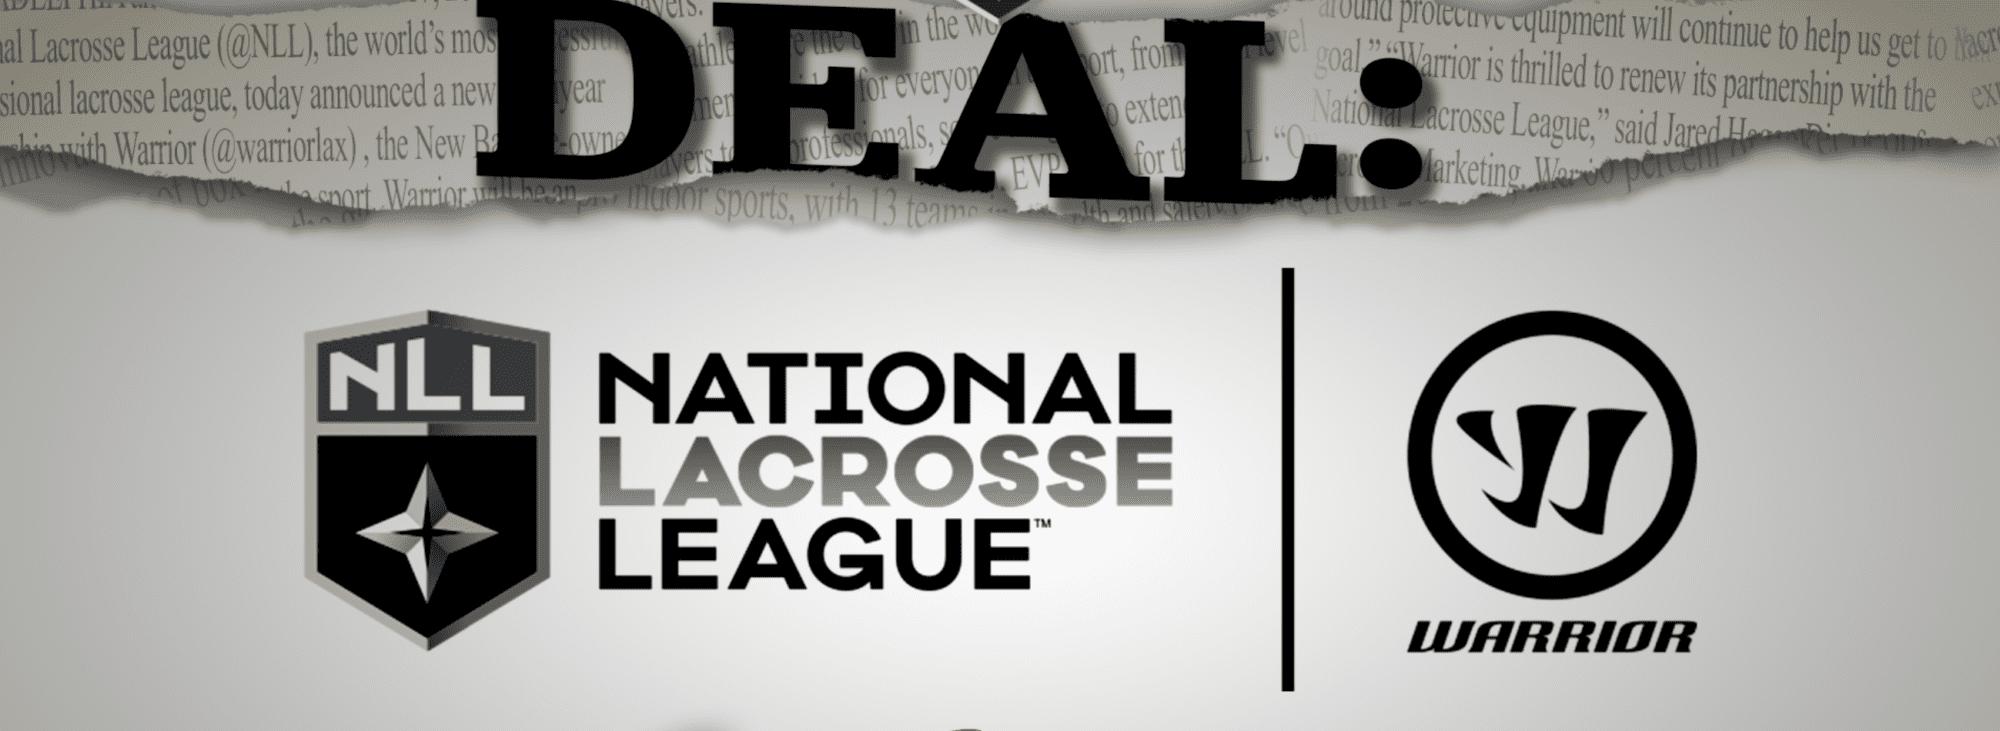 nll national lacrosse league warrior lacrosse new balance